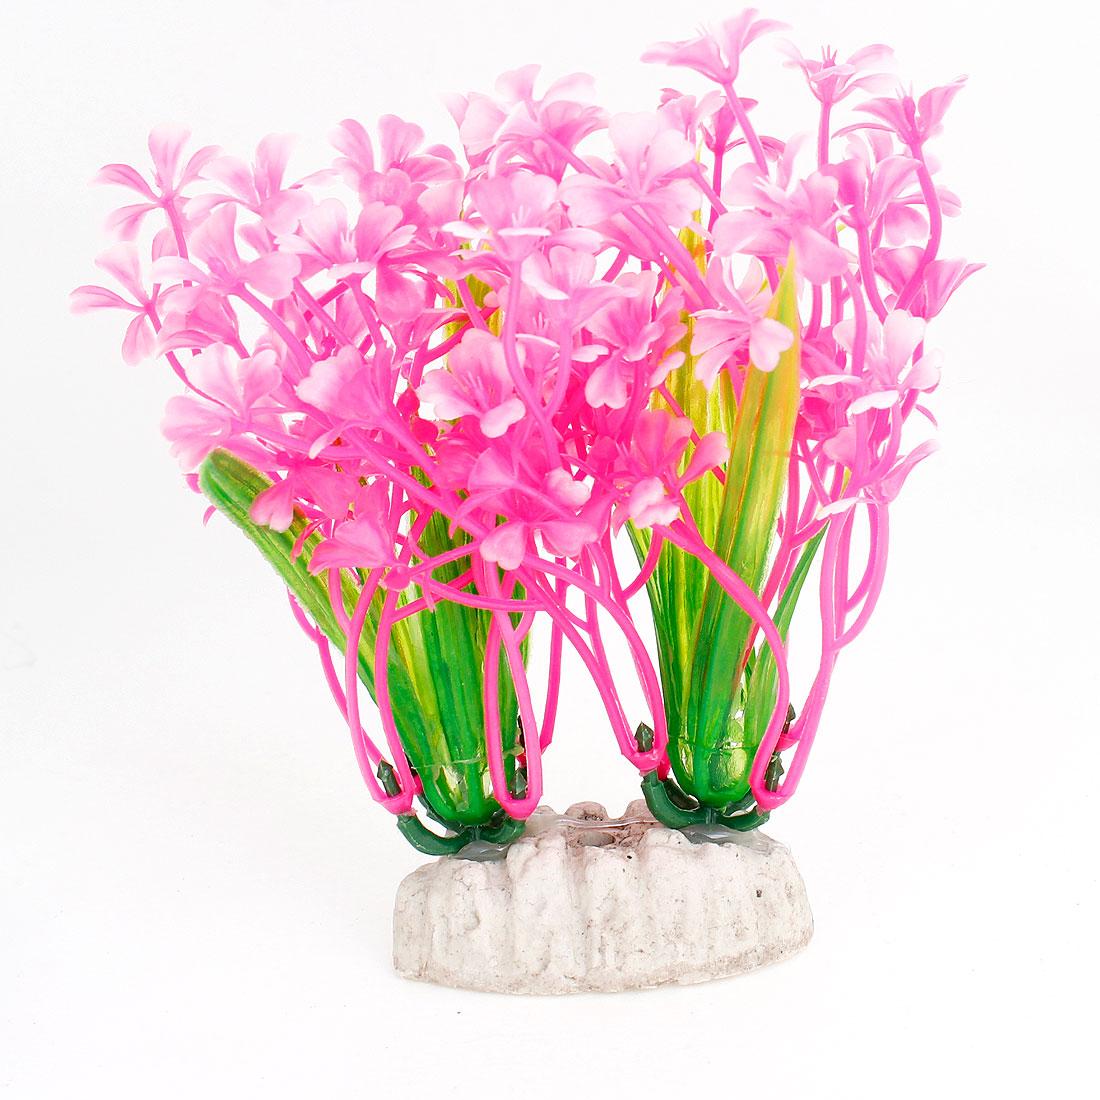 2 x Fish Tank Aquarium Hot Pink Emulational Plastic Grass Plants 12.5cm High